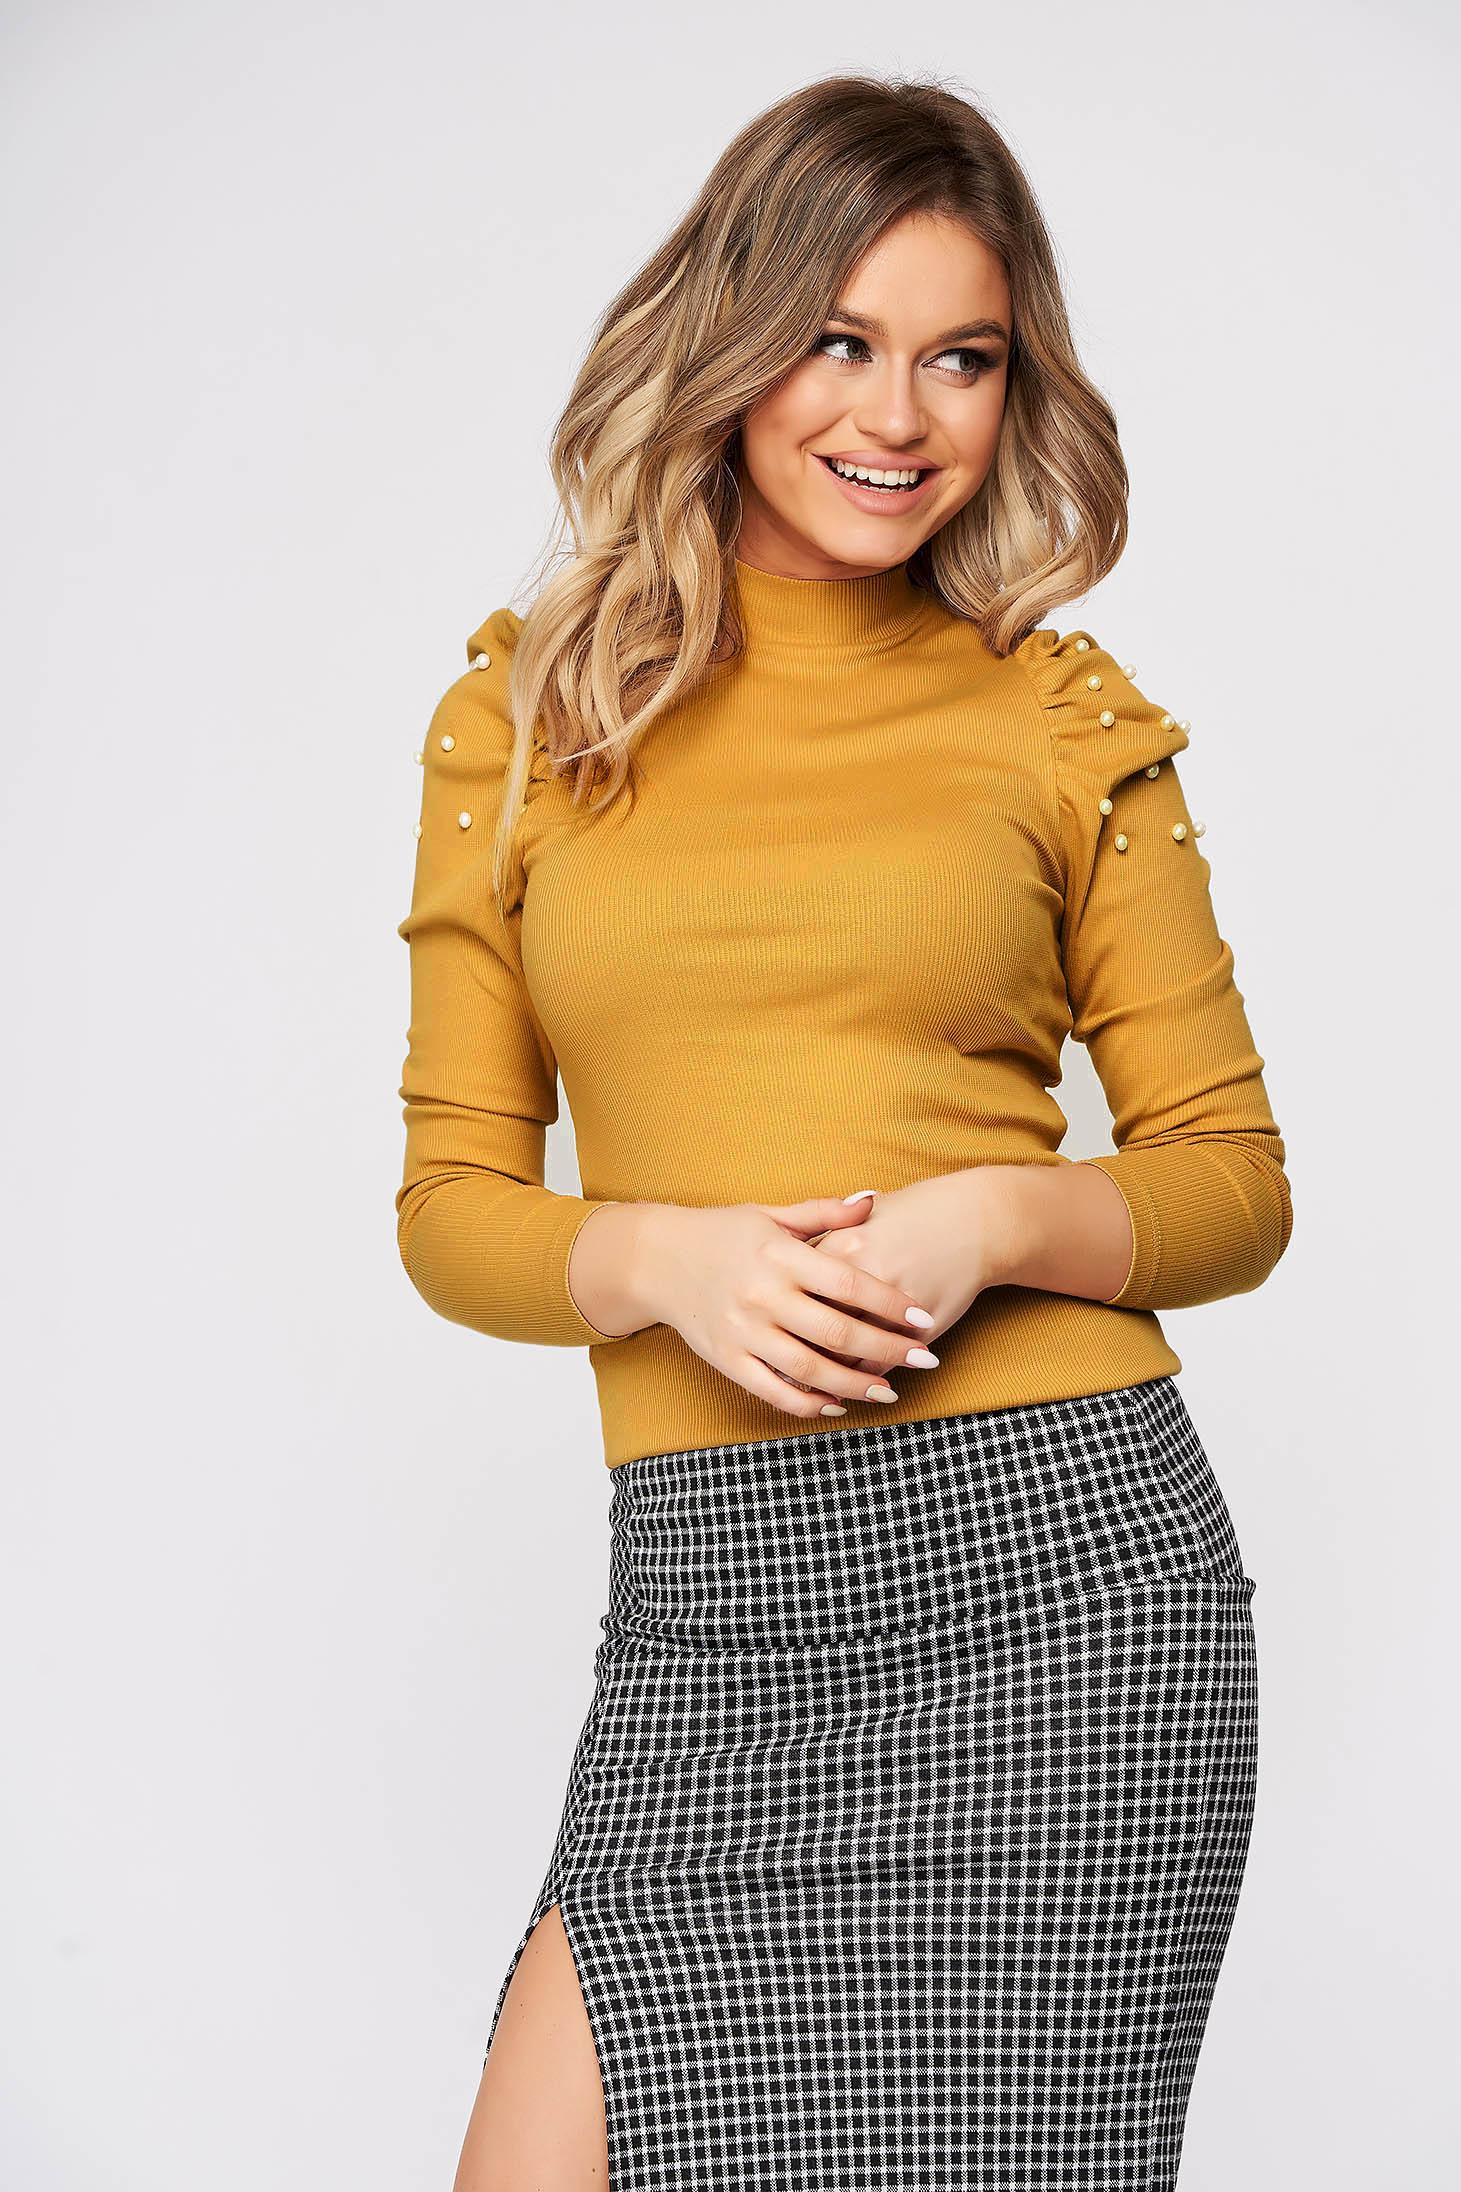 Bluza dama SunShine mustarie mulata pe gat din material reiat umeri cu volum